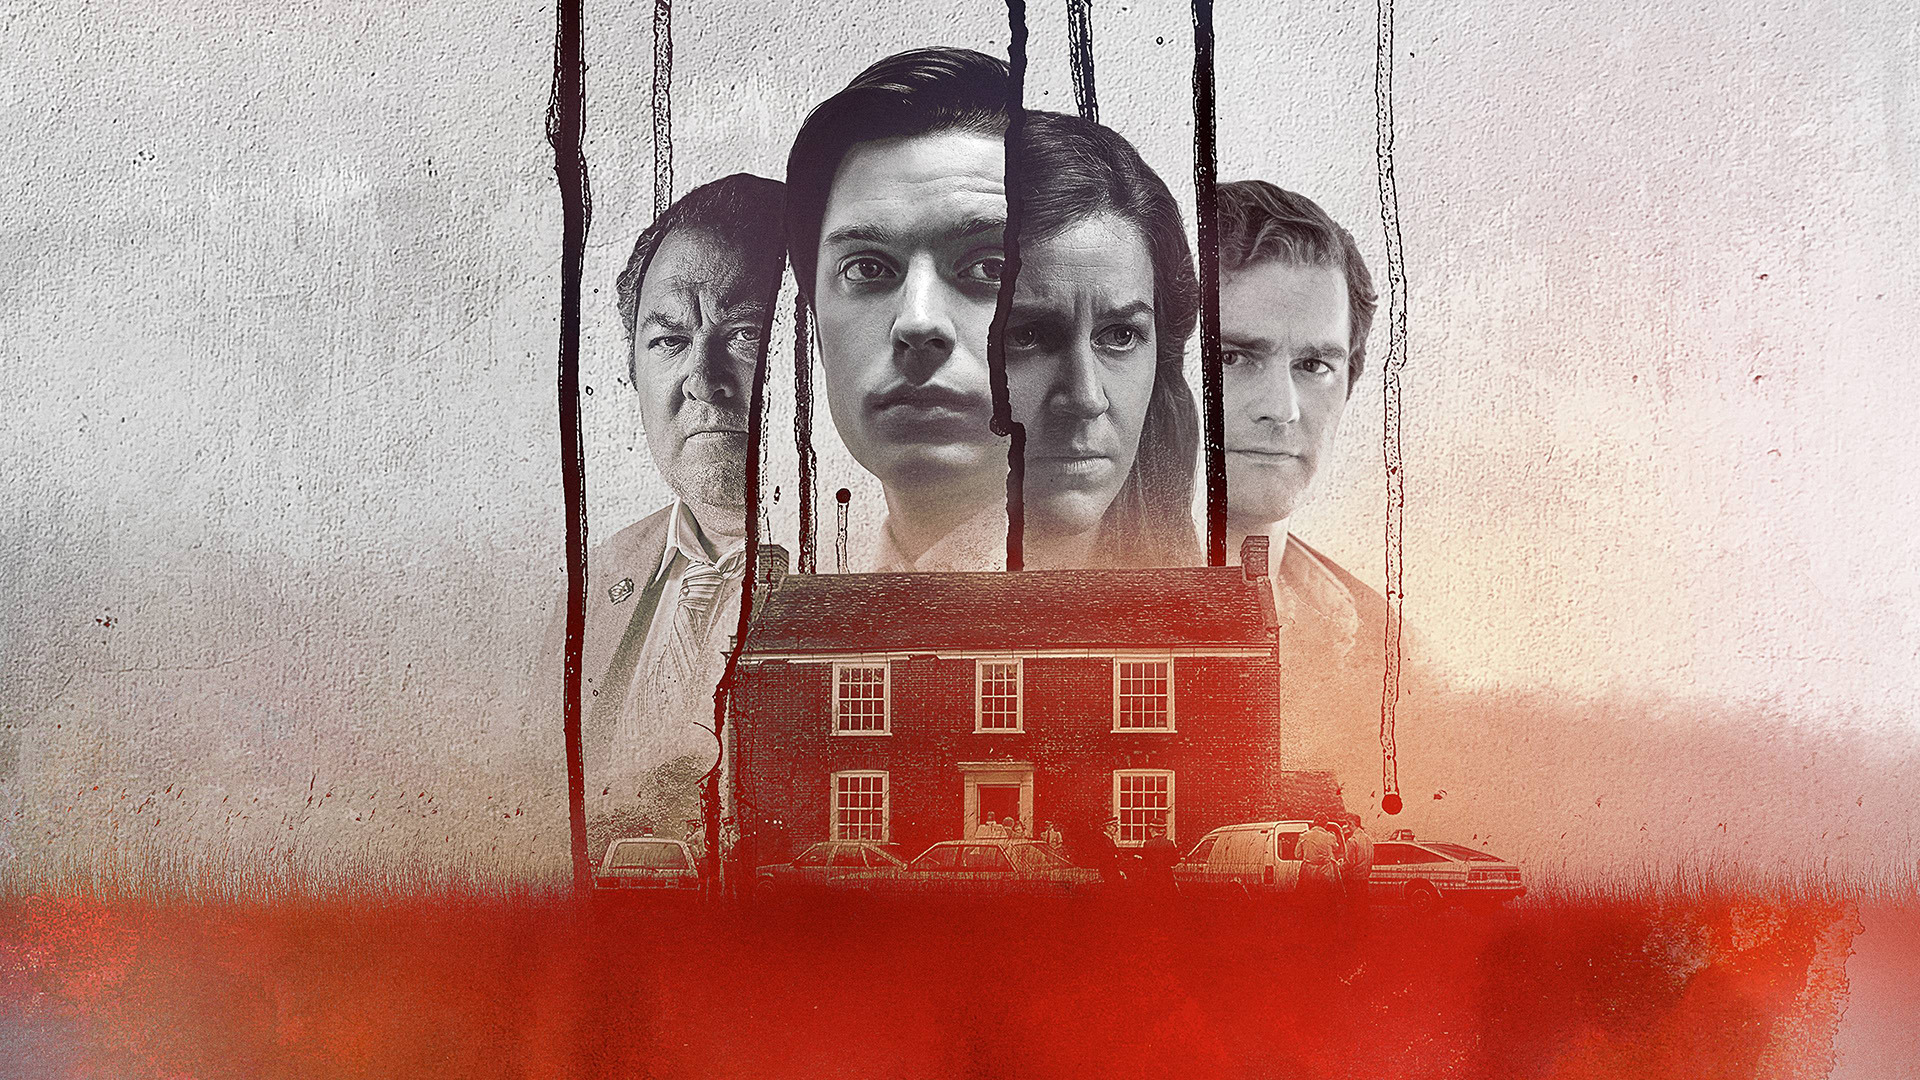 Сериал Убийство на ферме «Уайтхаус»